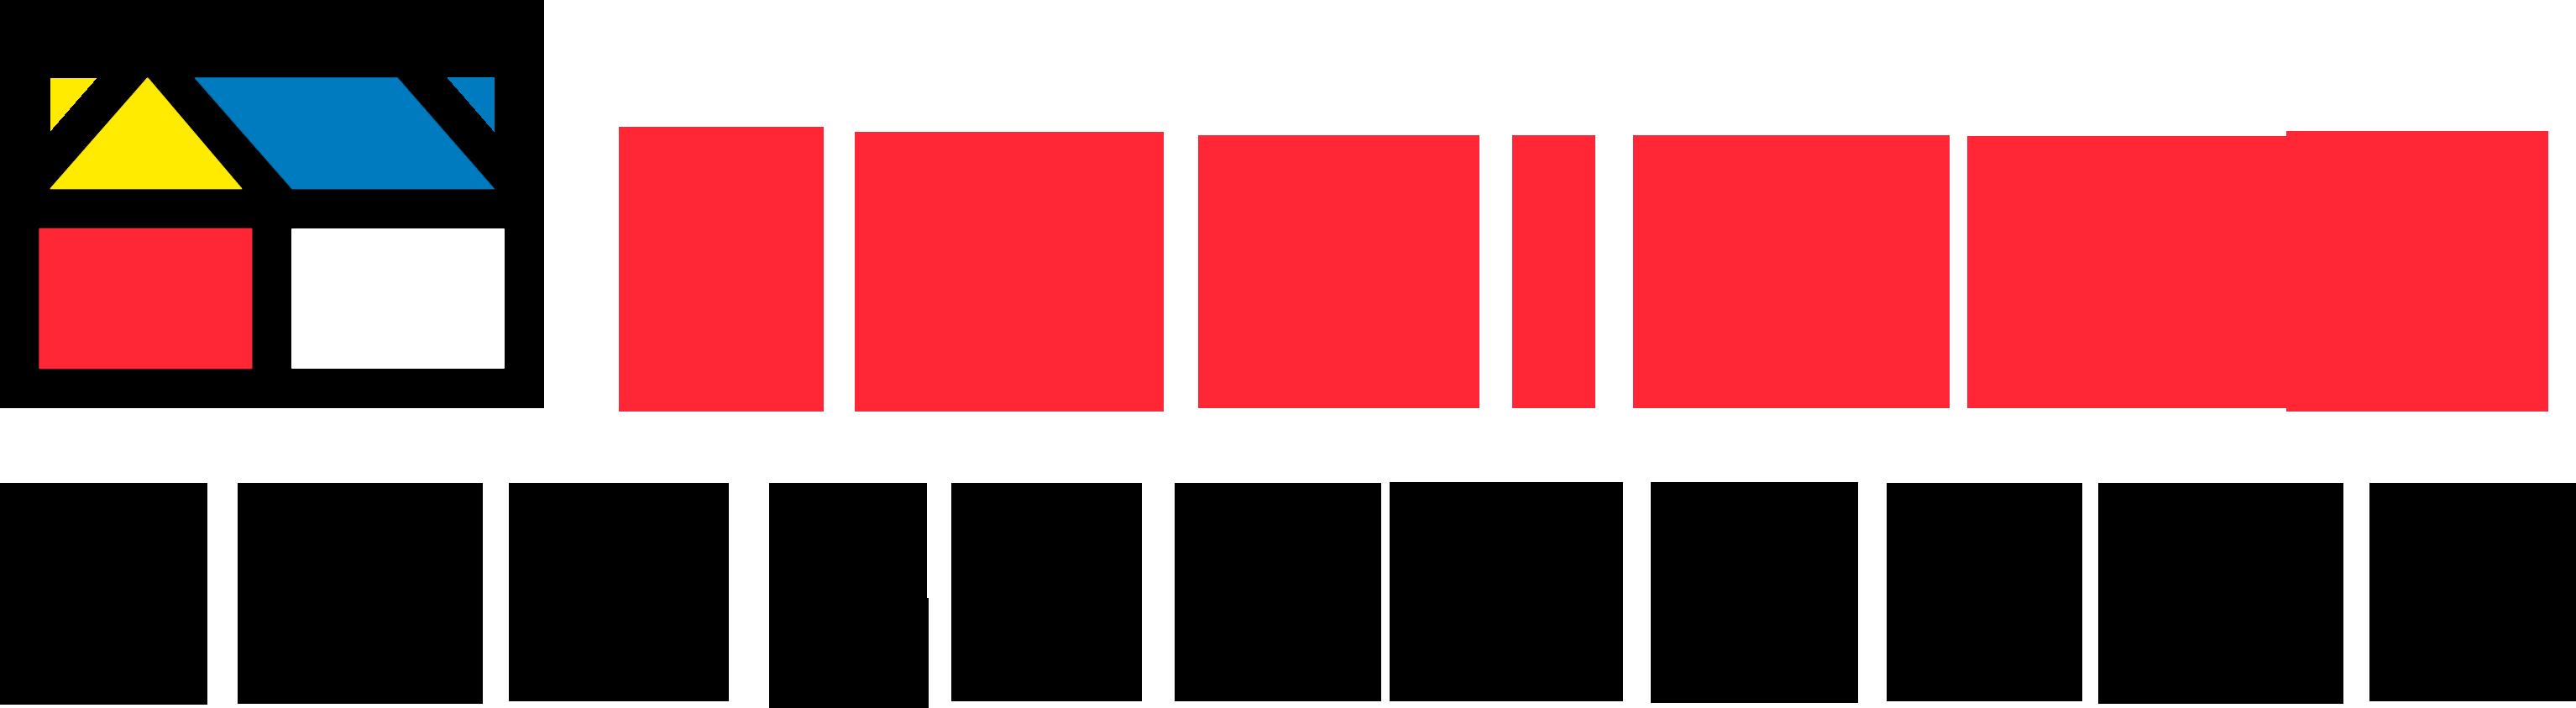 Sodimac Constructor (Brazil)